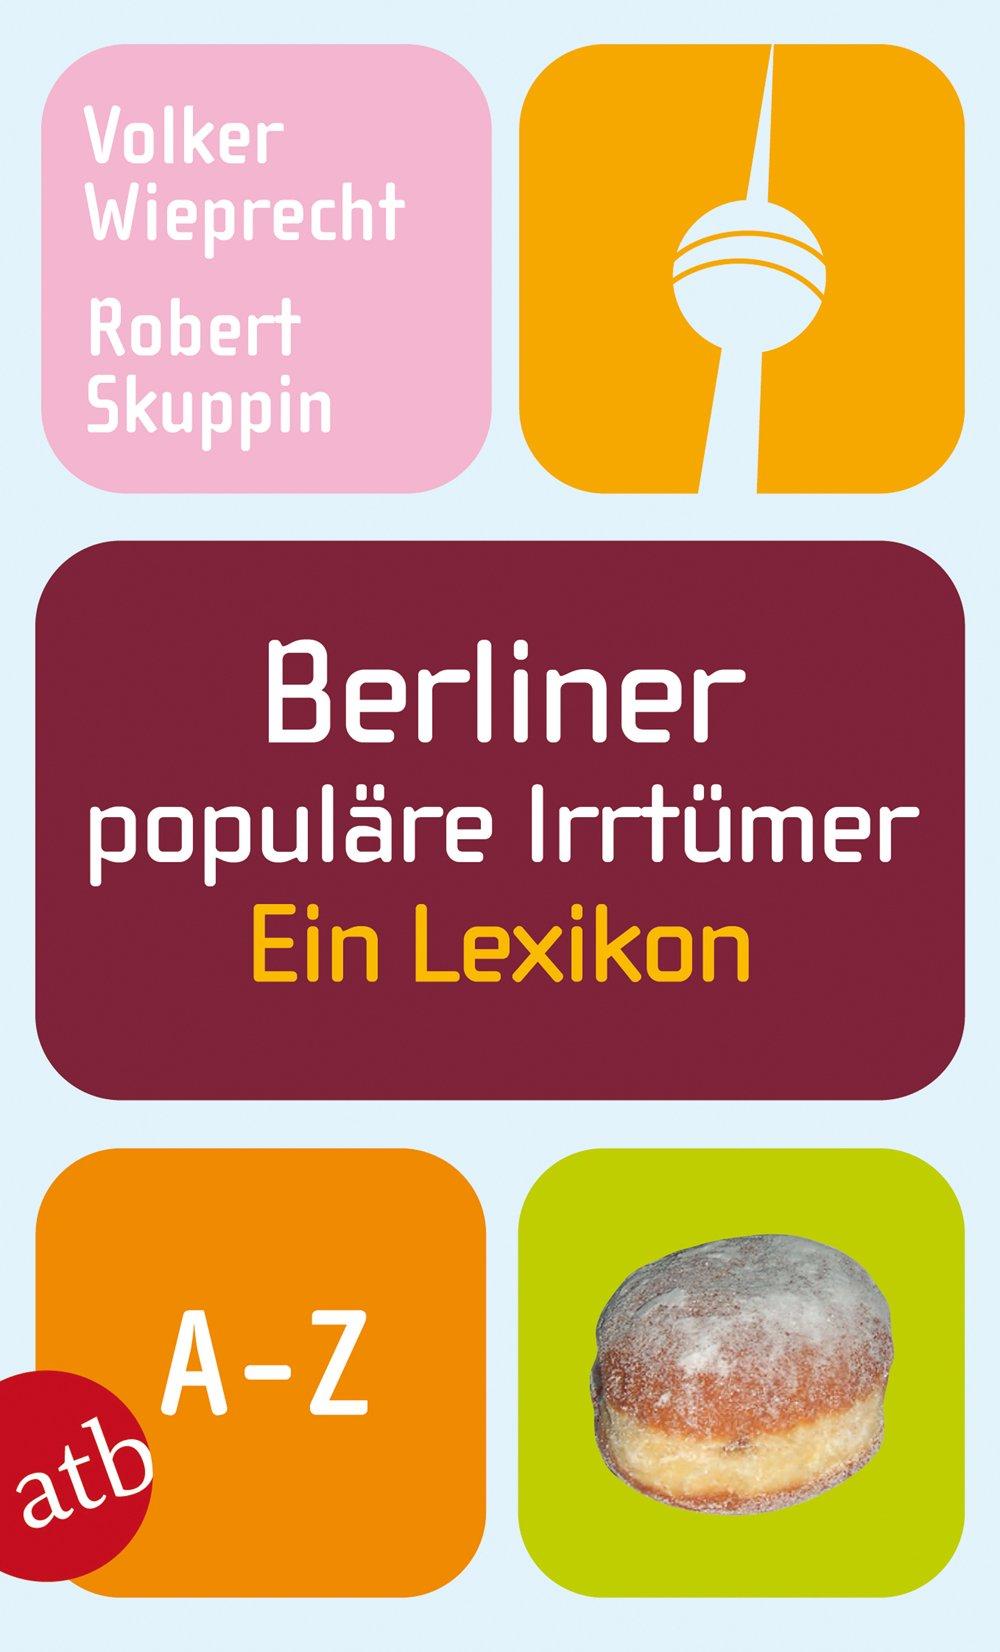 Berliner populäre Irrtümer: Ein Lexikon